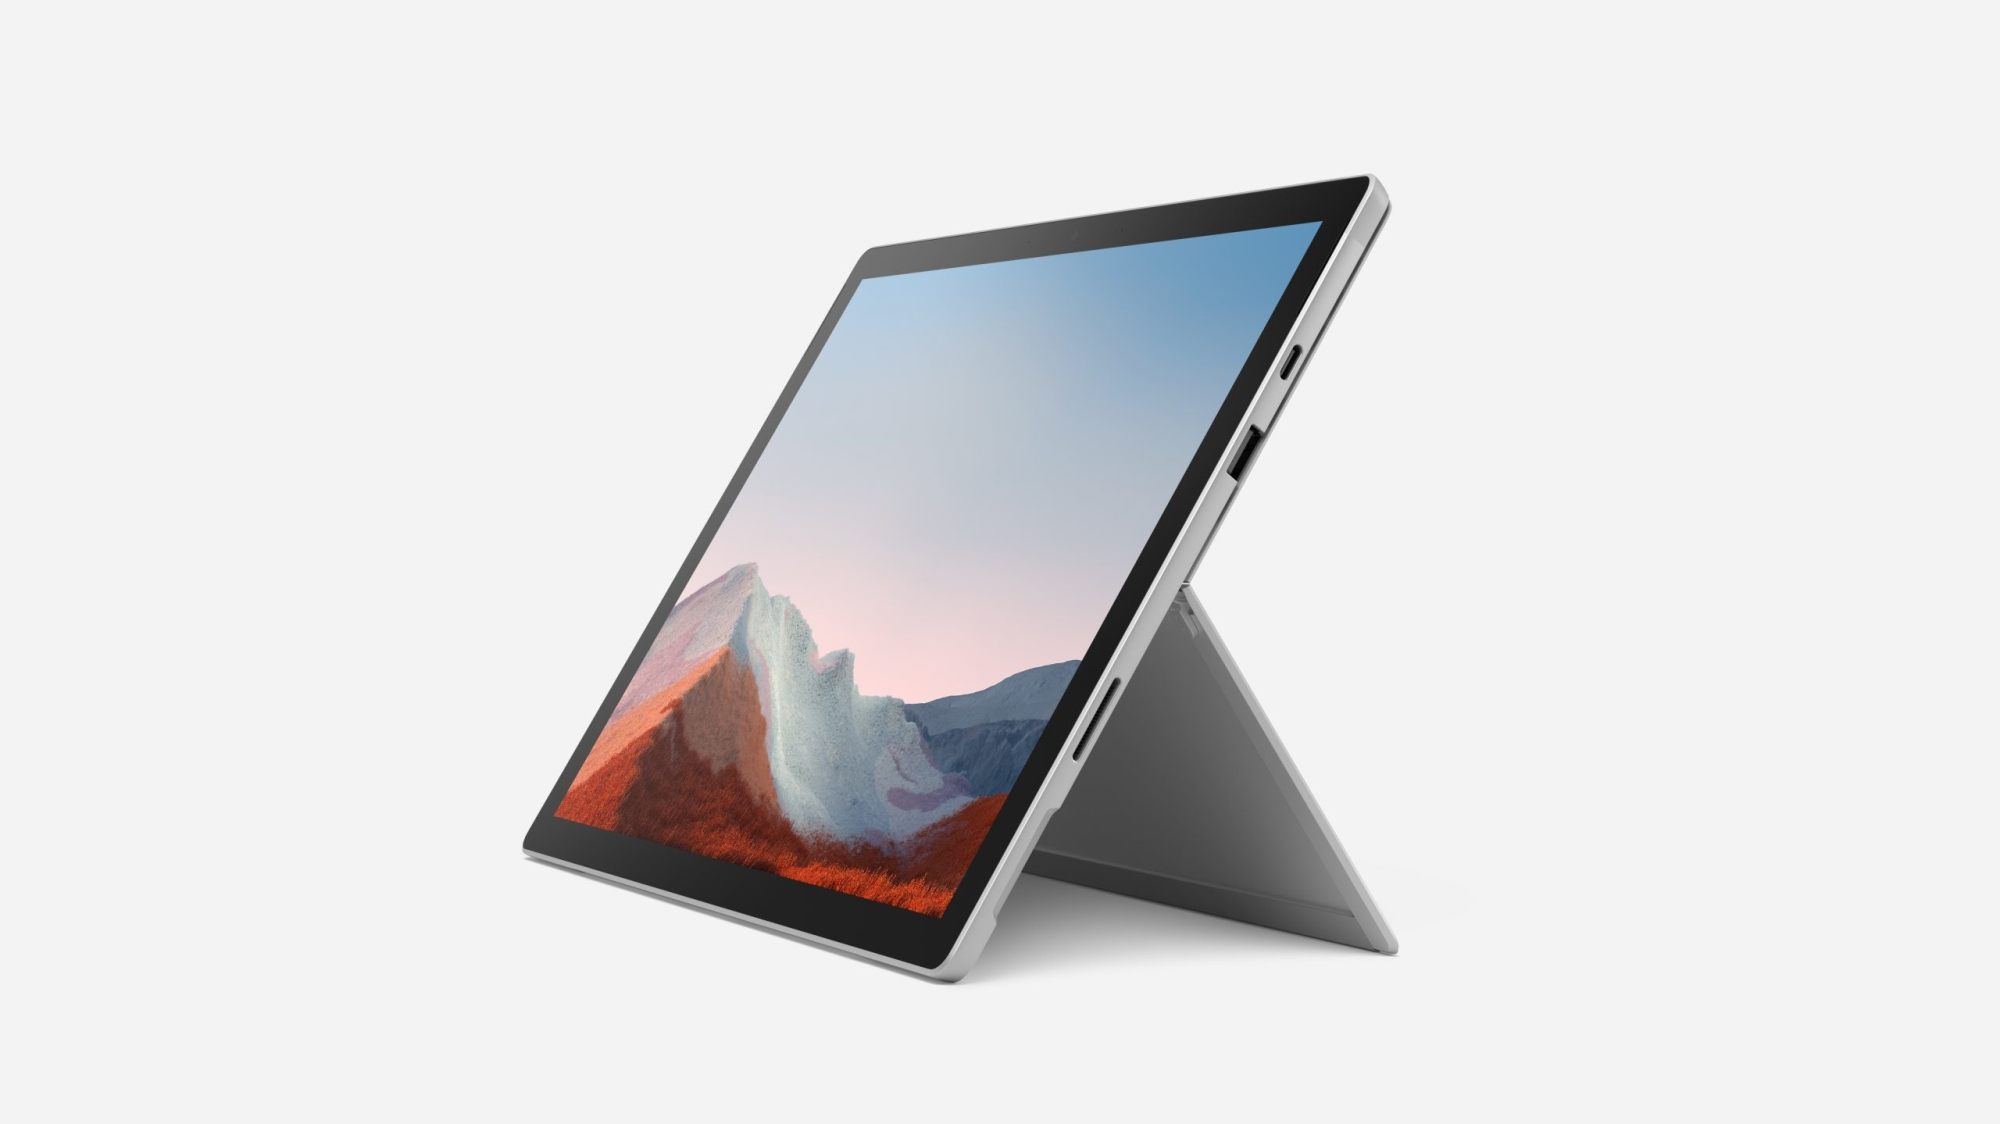 Surface Pro 7+ 128 Gb 31,2 Cm (12.3) Intel Core I5-11xxx 8 Gb Wi-fi 6 (802.11ax) Windows 10 Pro Platino